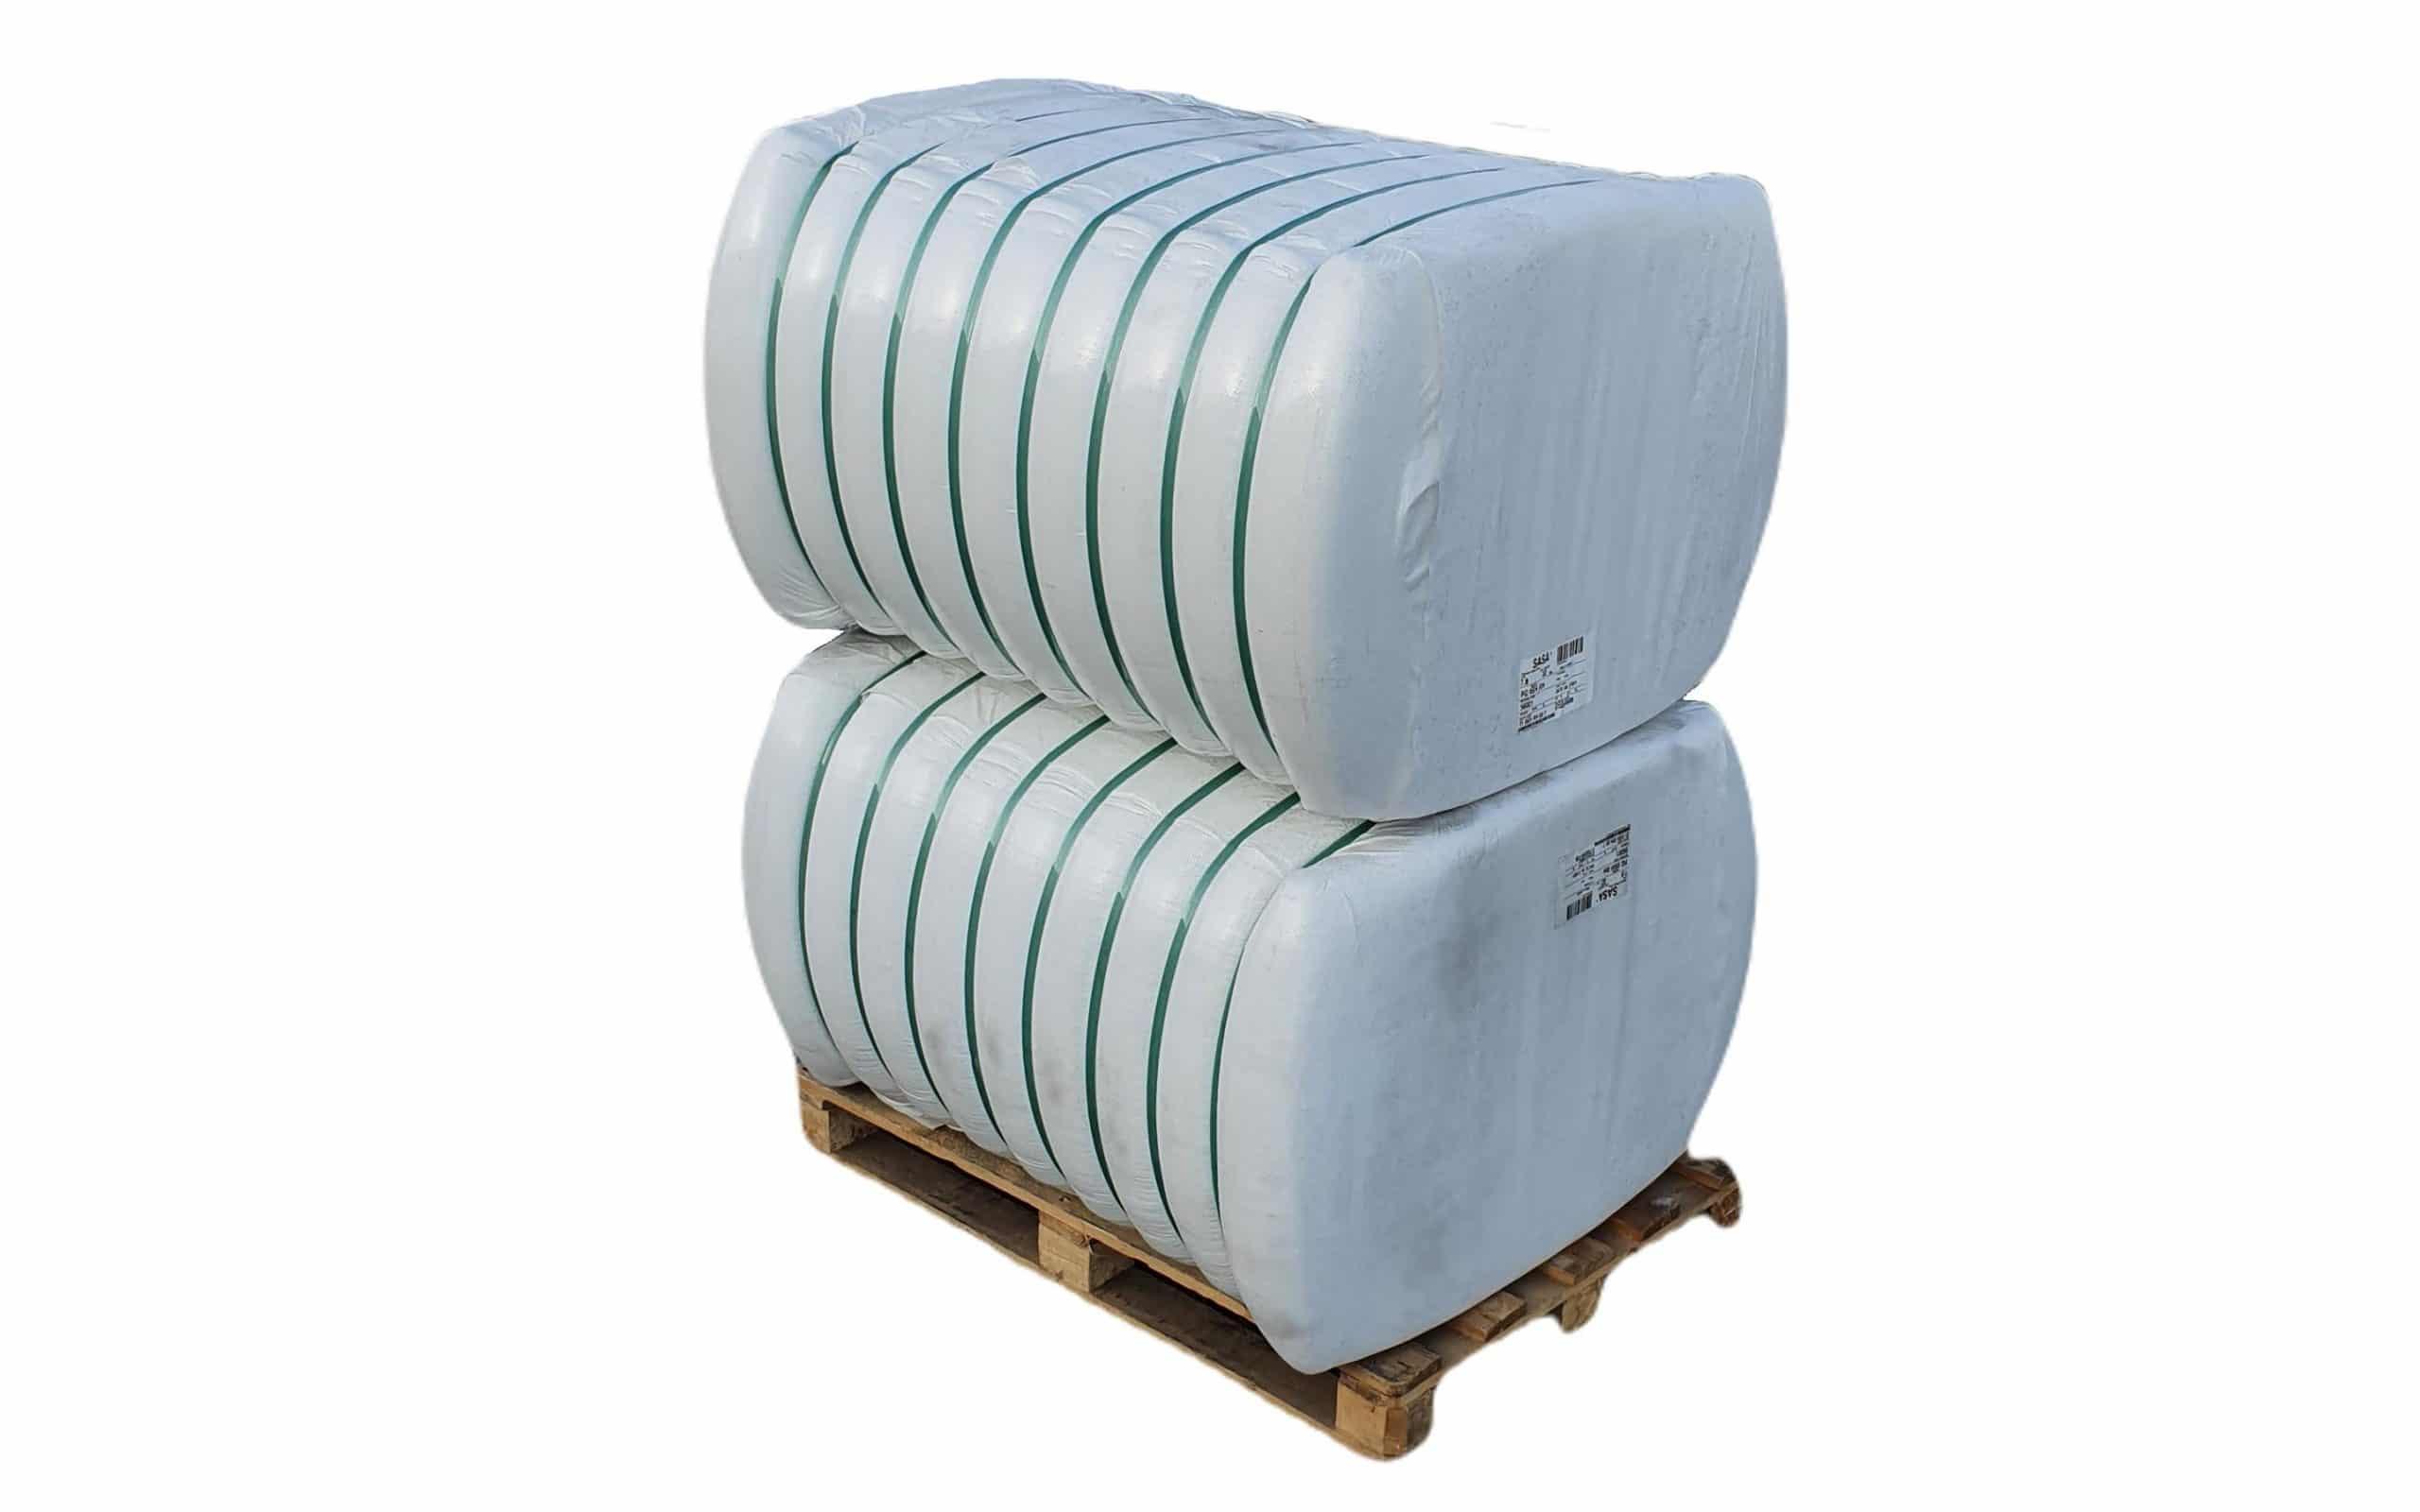 Fibra poliester hollow siliconizata conjugata, HCS 7D x 32 mm pentru fabricare umplutura perne si pilote, 2 x 250 Kg poza somnart.ro